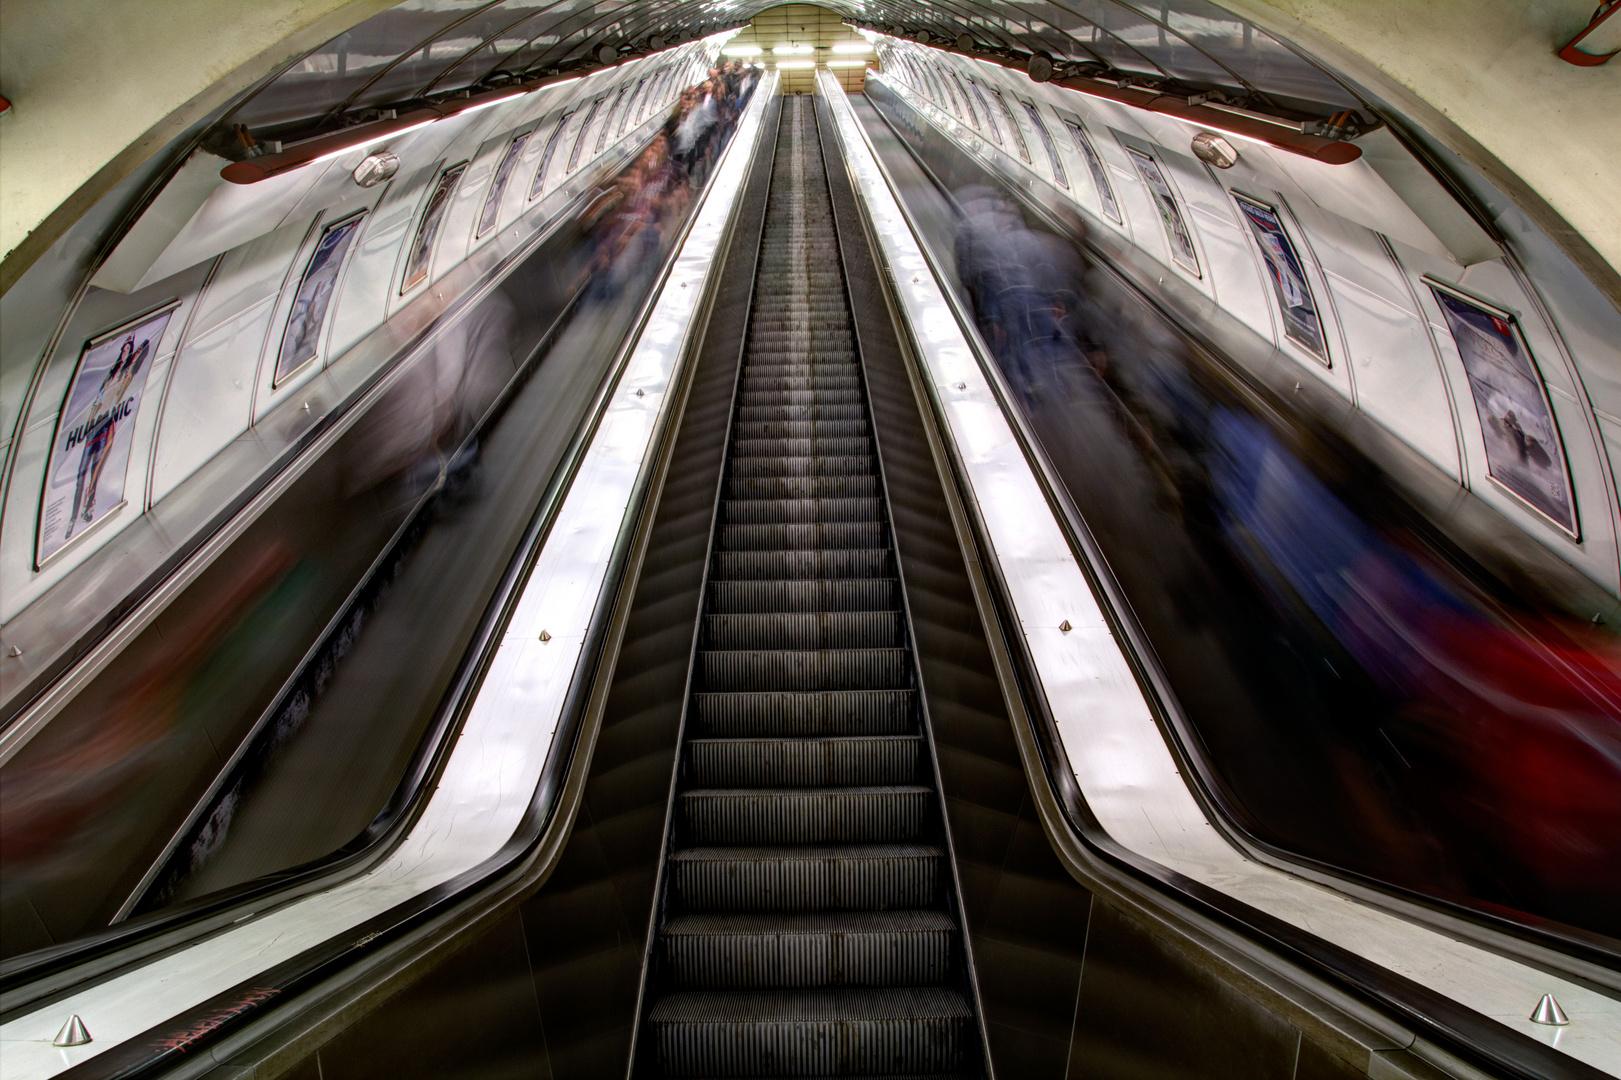 Nimm die Rolltreppe